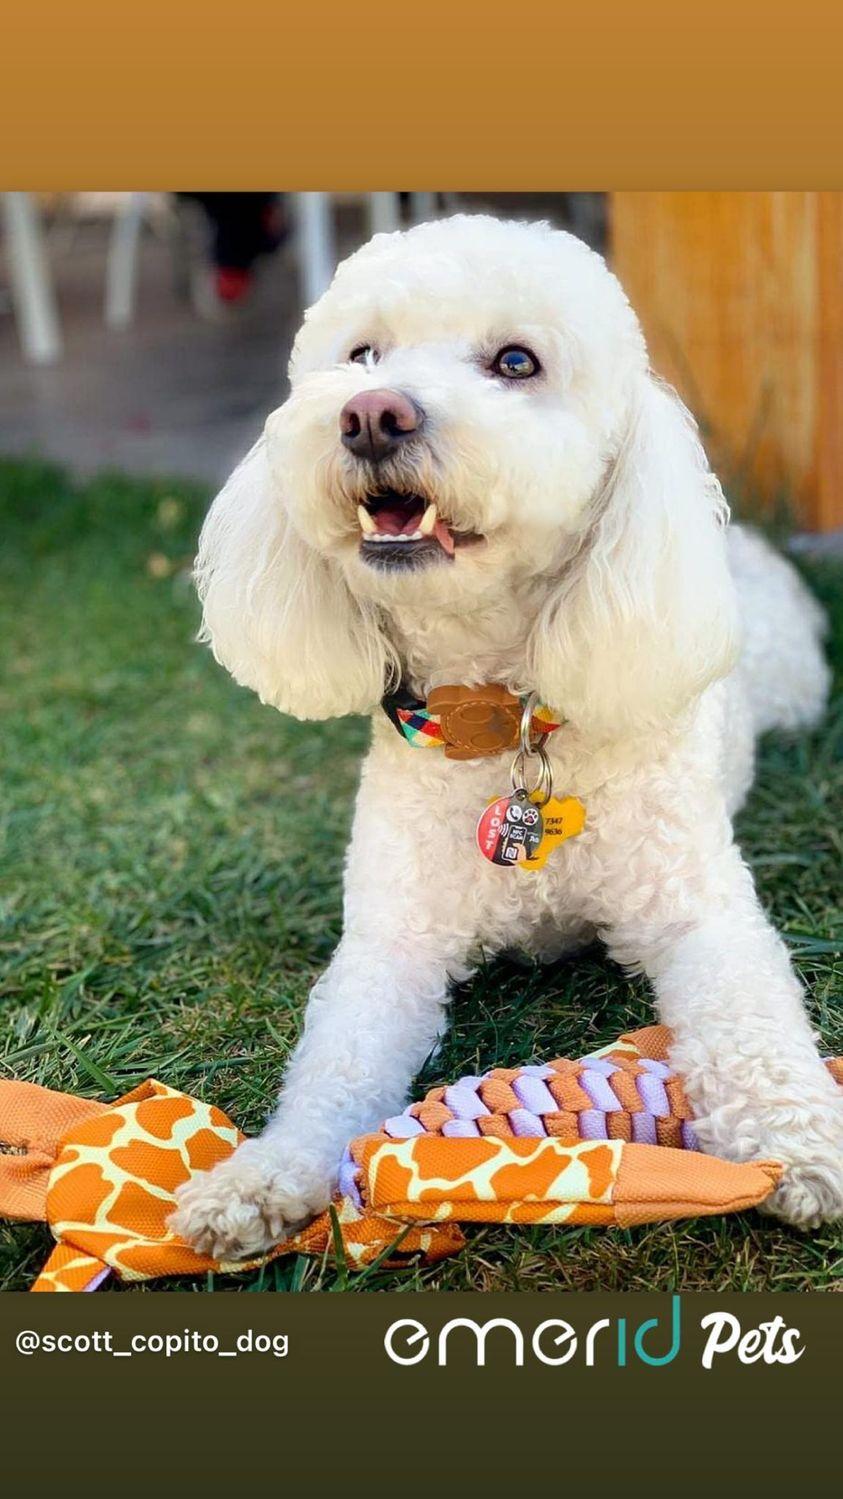 scott_copito_dog pet id nameplate NFC Emerid pets